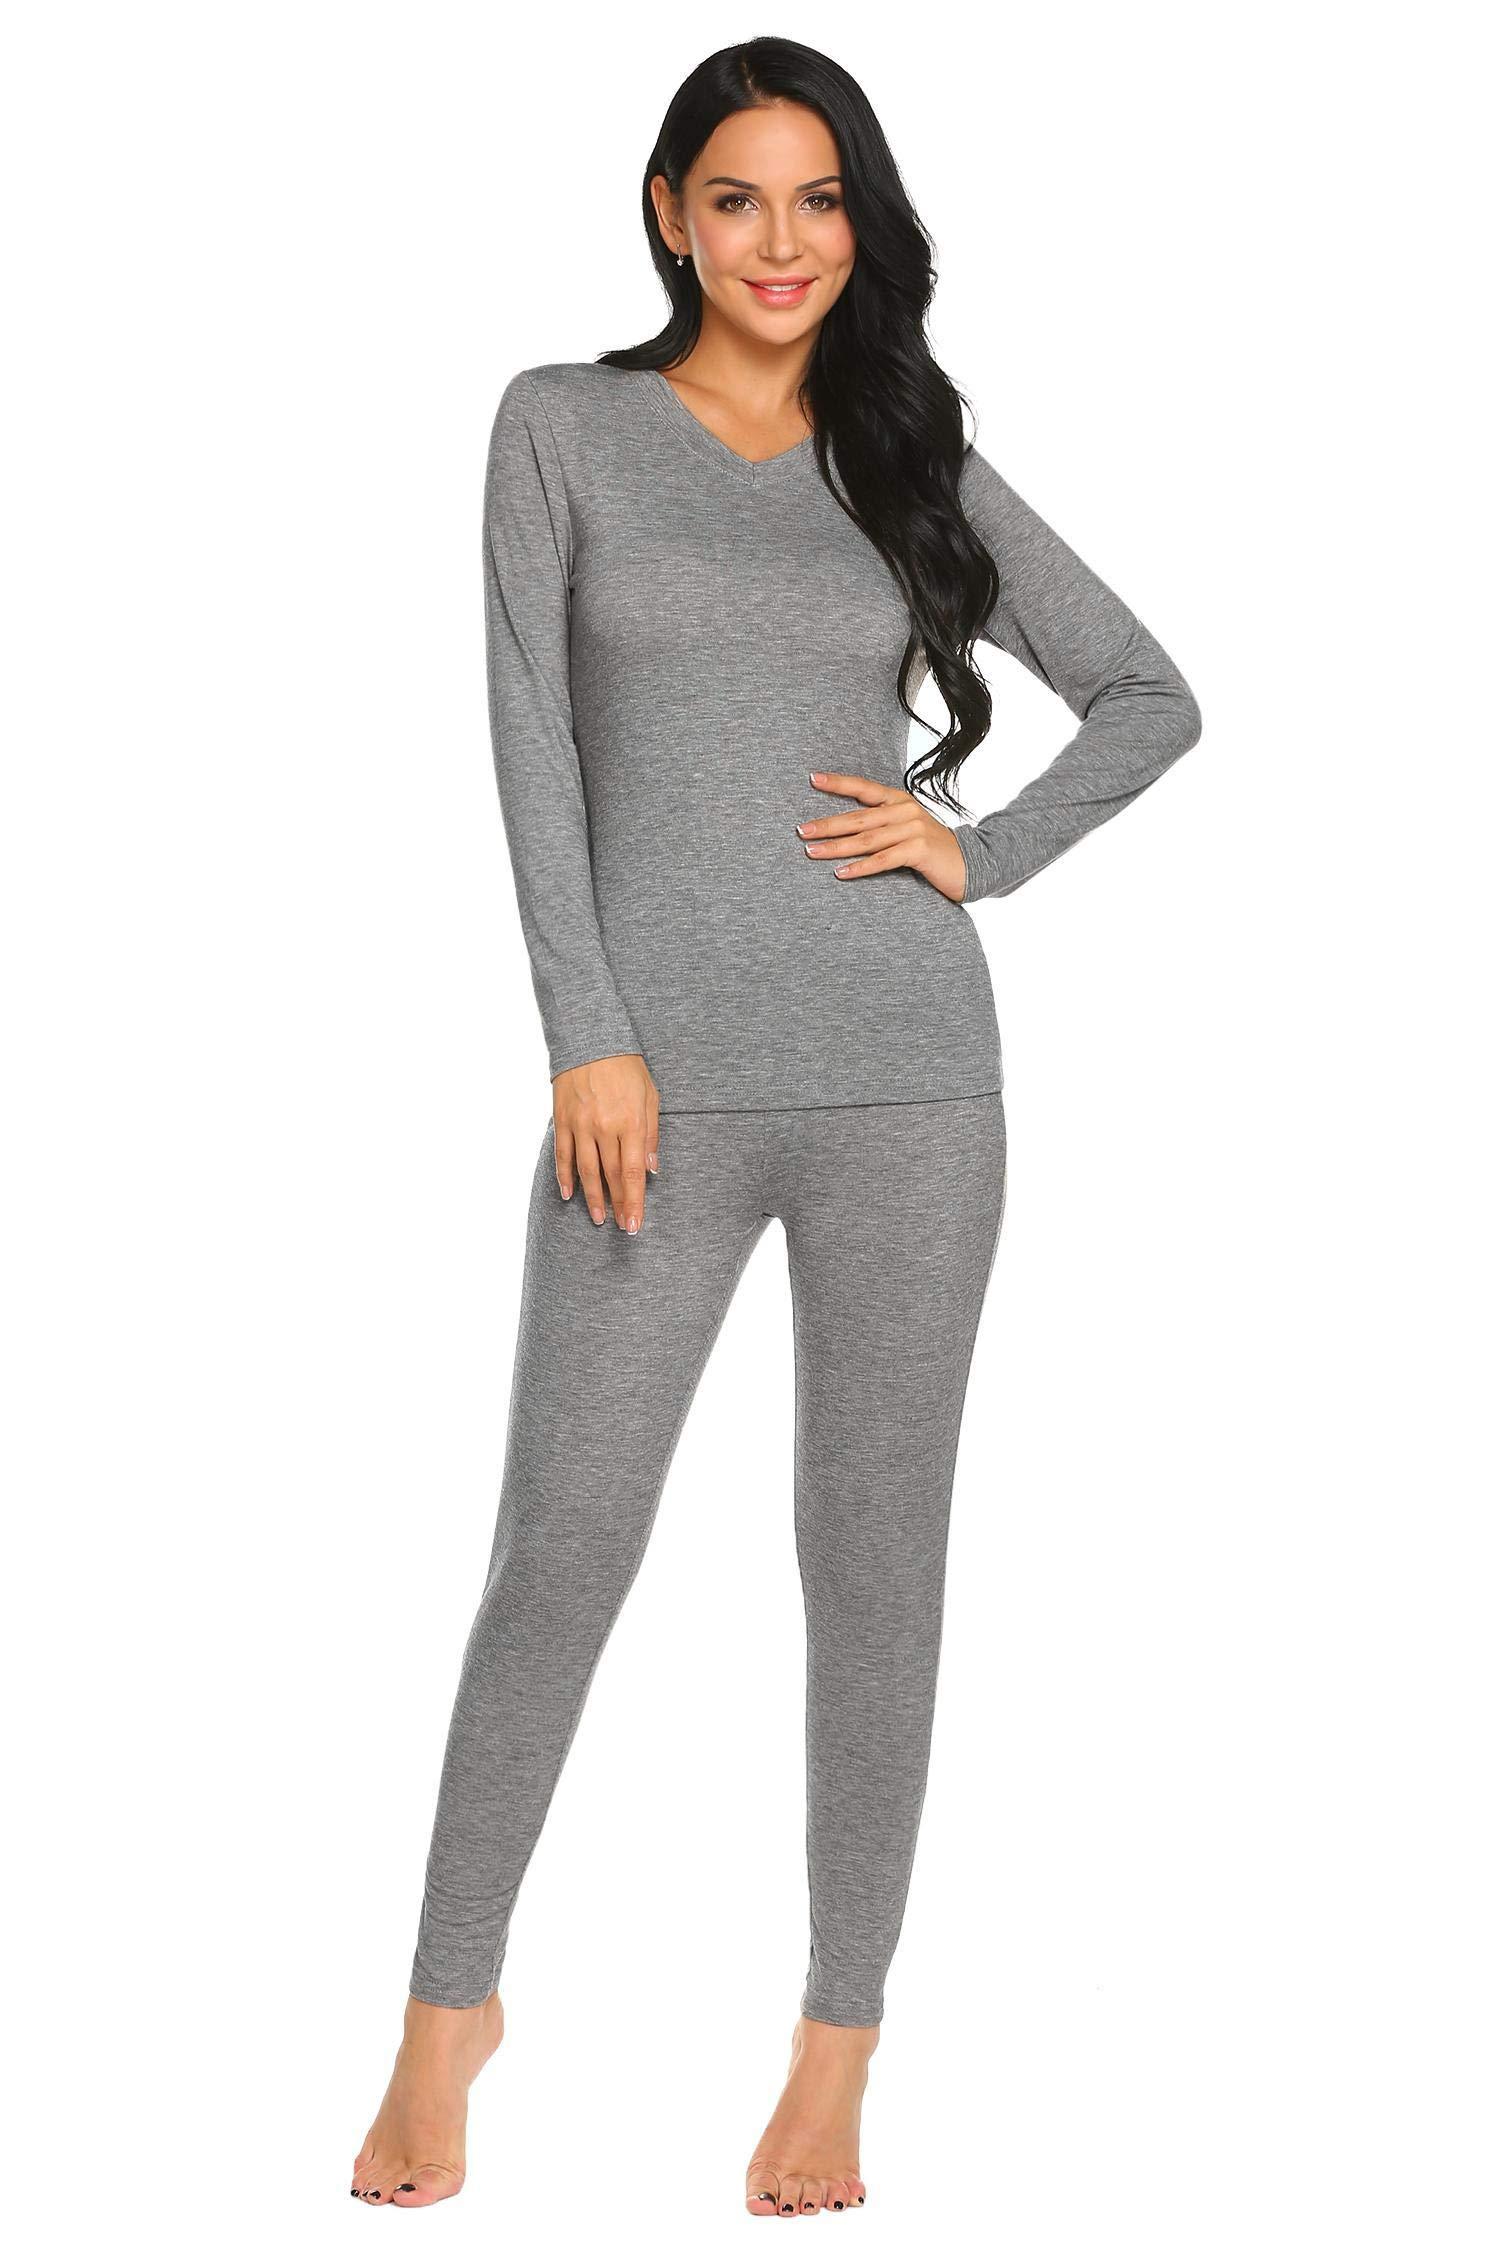 Ekouaer Thermal Sets V Neck Pajamas Sleepwear Top with Pants Long Sleeve Pj Set